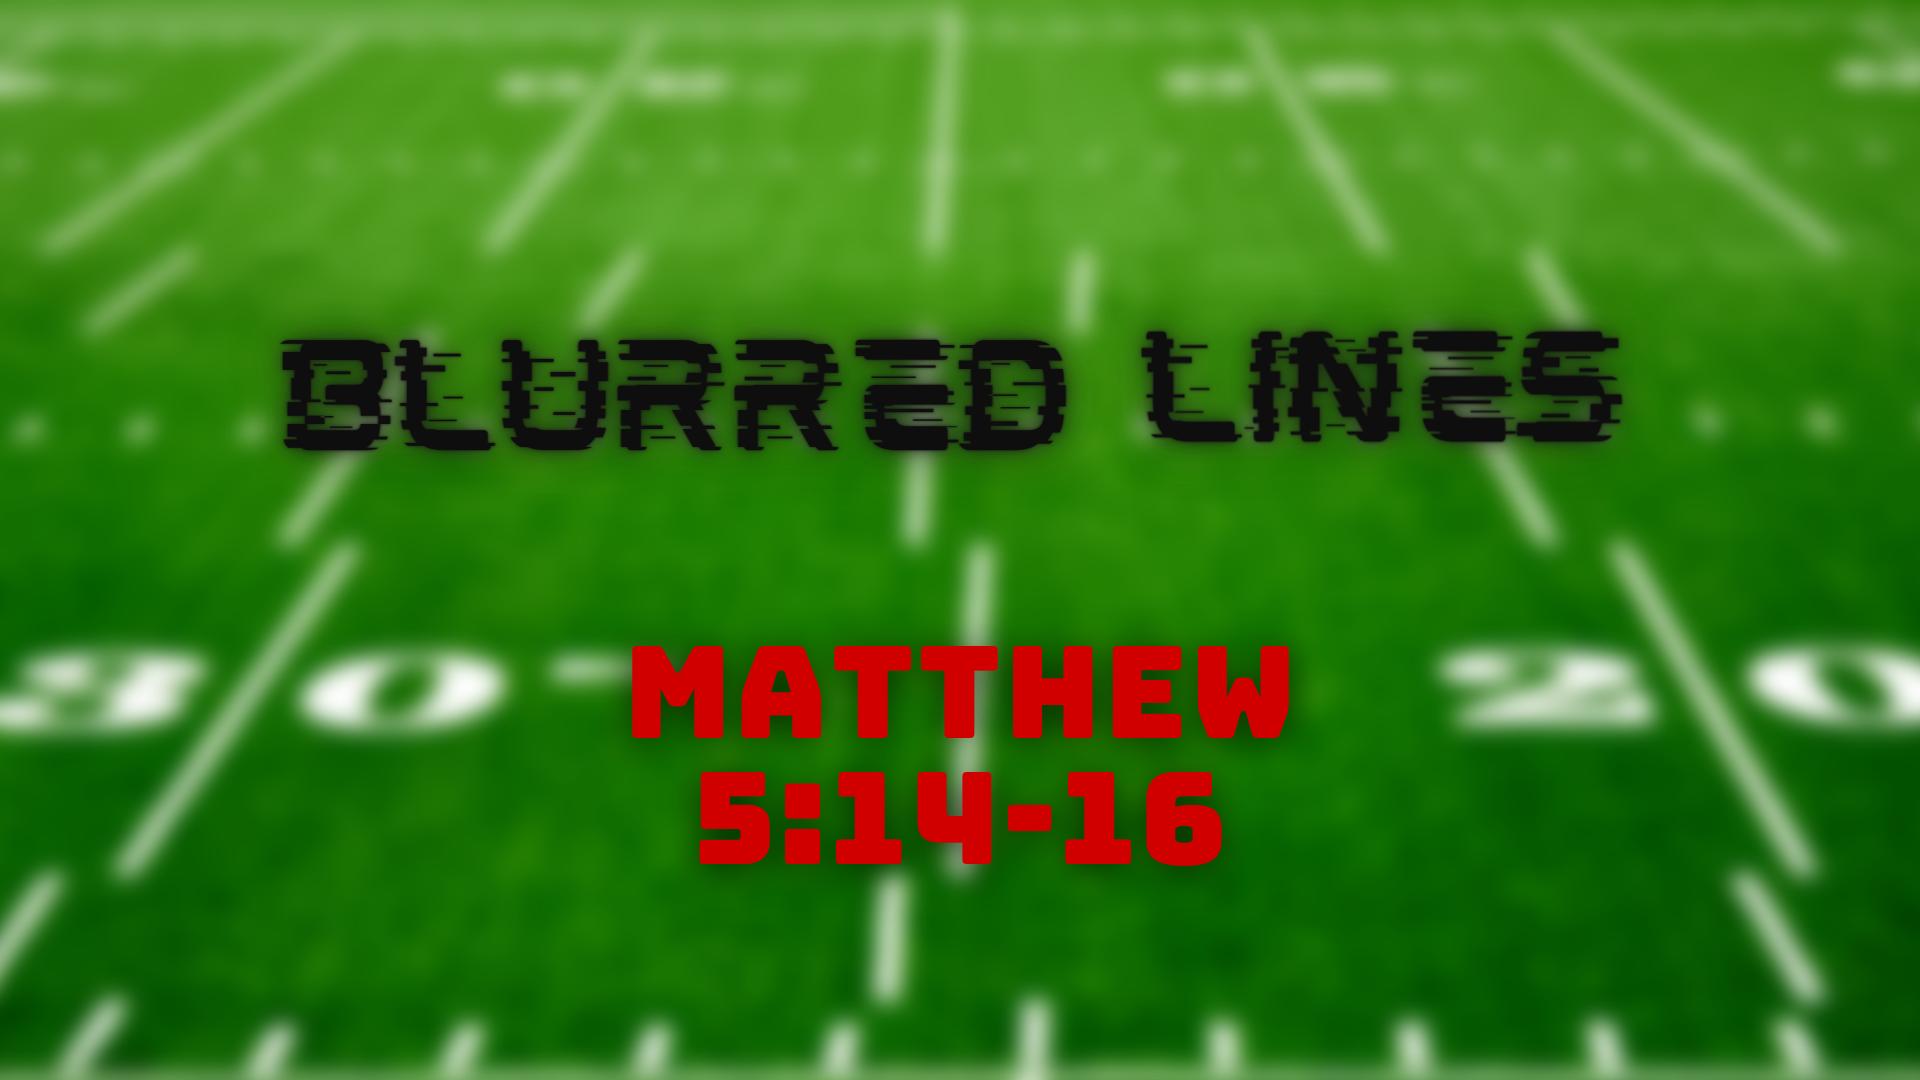 Blurred Lines Matthew 514-16